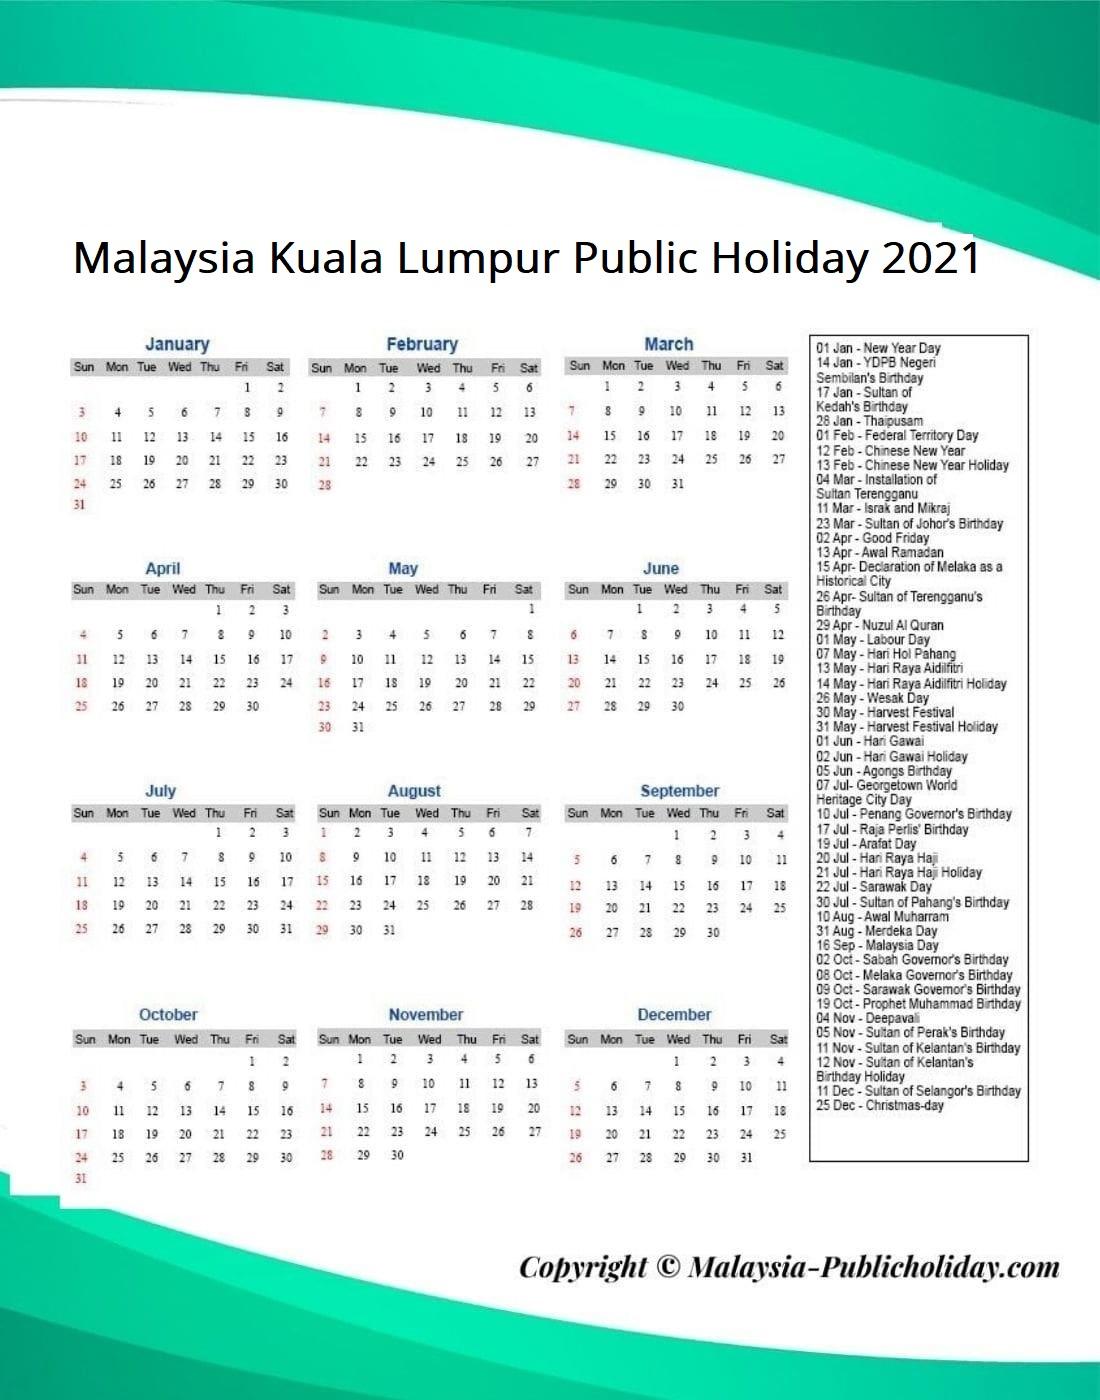 Kuala Lumpur Public Holiday 2021